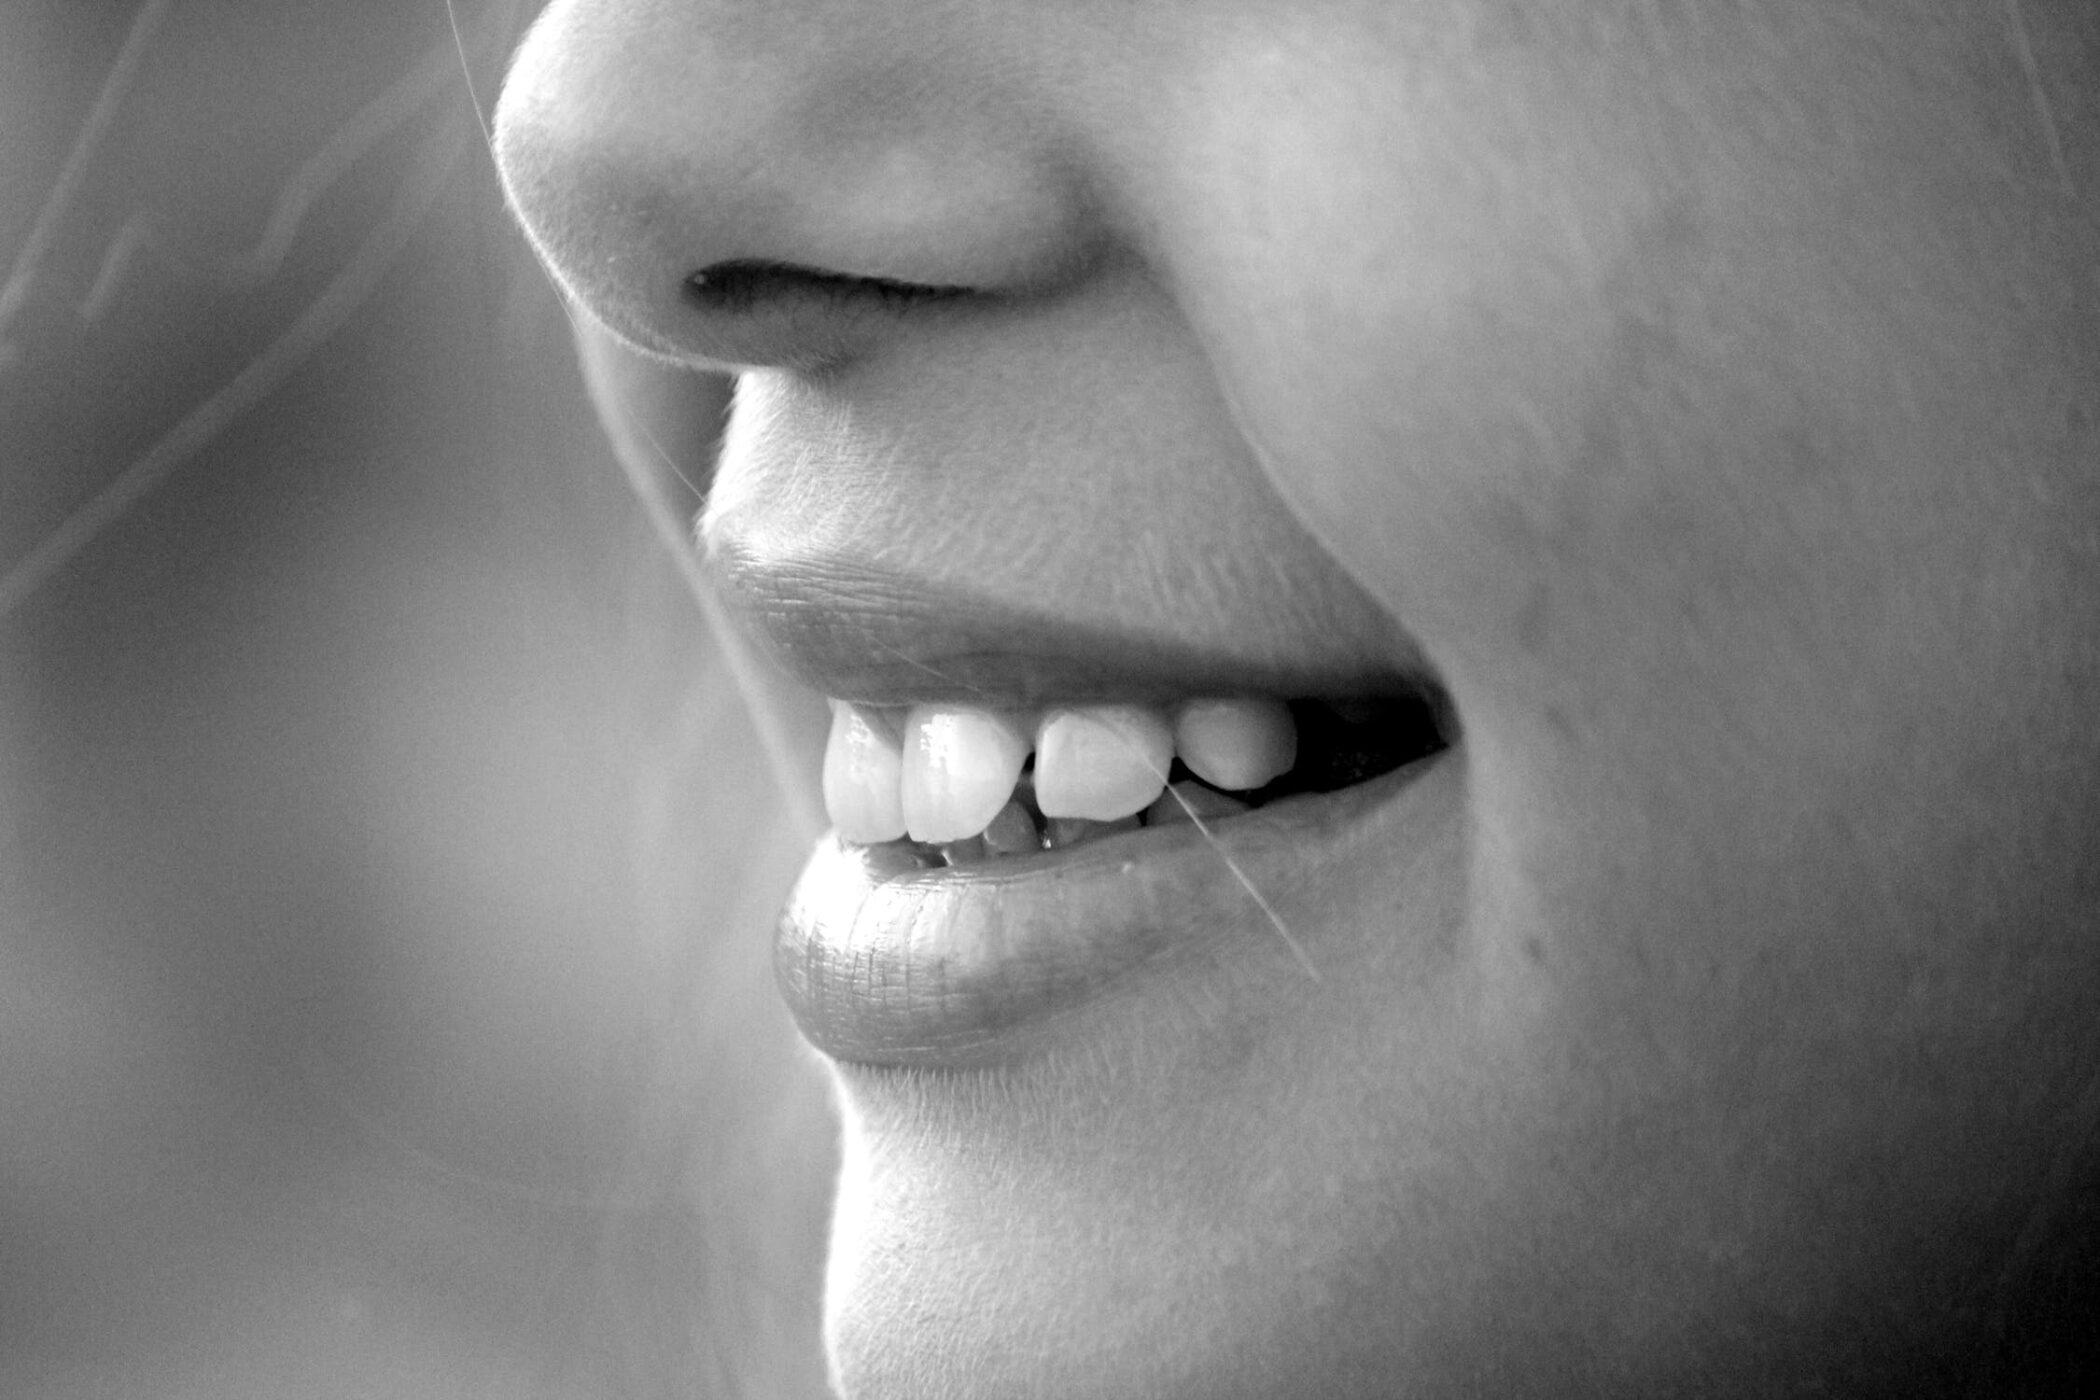 dental health, new teeth